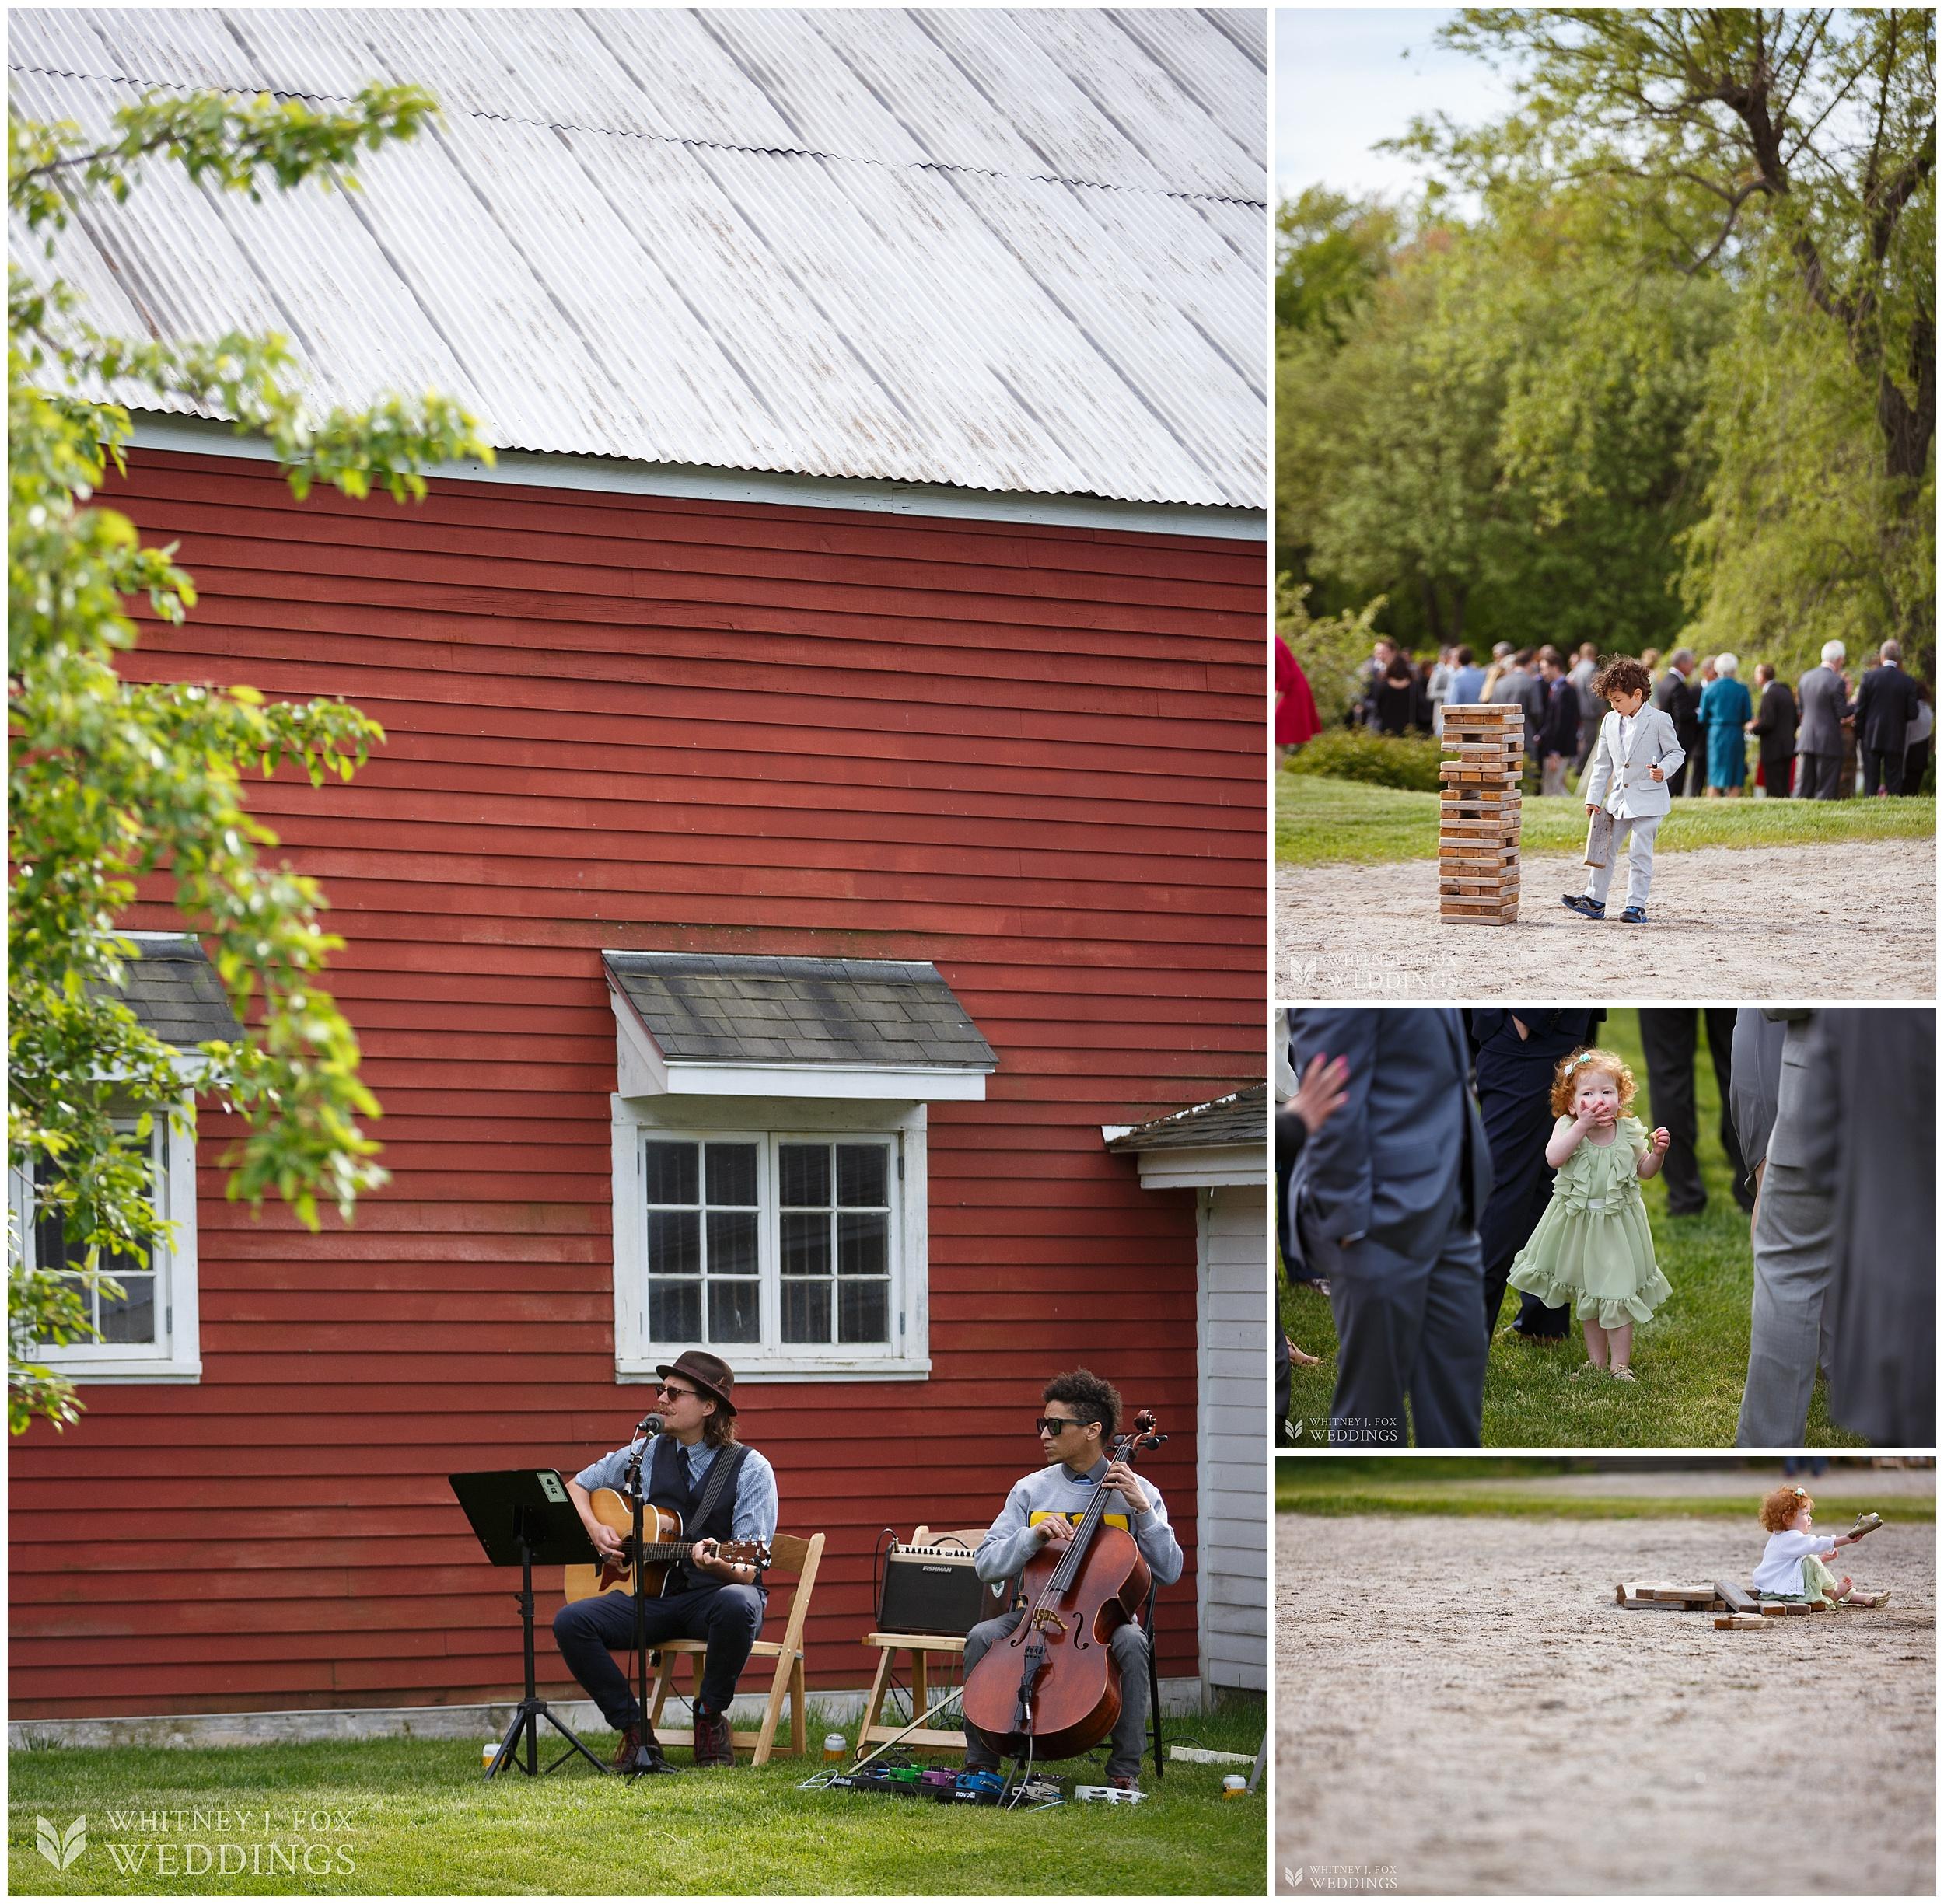 57_102_tai_josh_the_homestead_rest_be_thankful_farm_lyman_maine_photographer_whitney_j_fox_weddings_1725.jpg